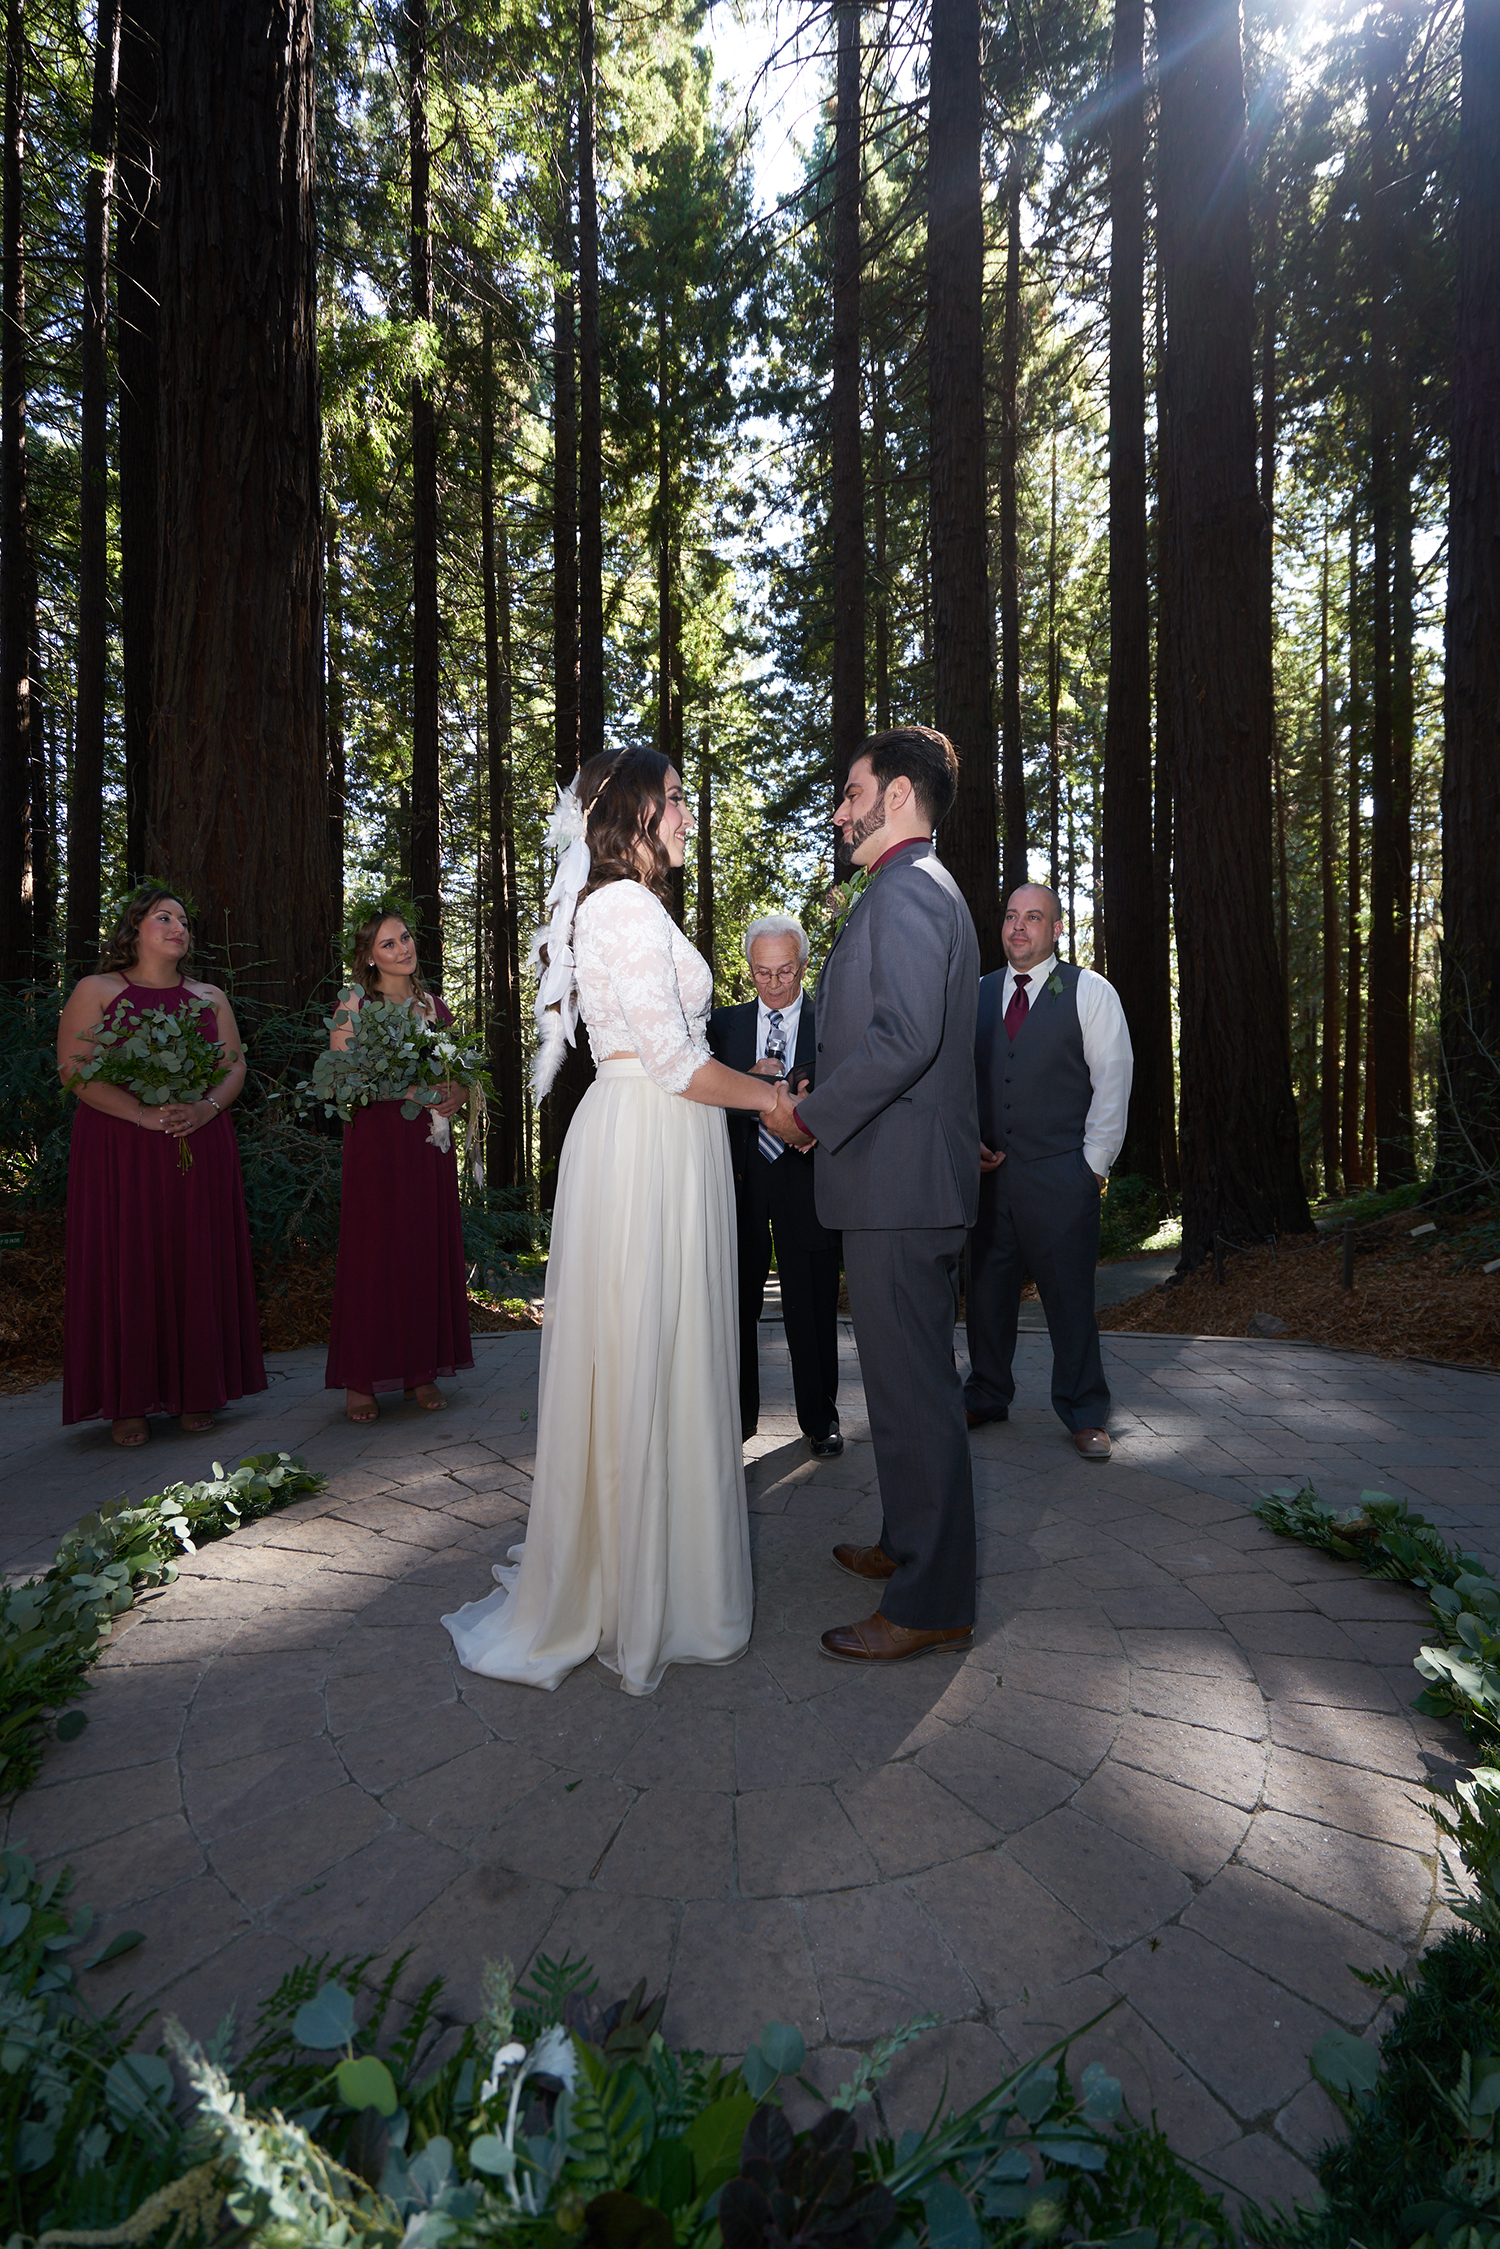 100717_Lenora_Jesse0202-weddingdress-bride-weddingphotography-best-weddingphotographer-bridal-groom-wedding-engagementring-proposal-brides-diamondring-sonyalpha-sony-sonya7rii-sanfrancisco-sf-bayarea-photographer-profoto-berkeley-botanical-garden.jpg